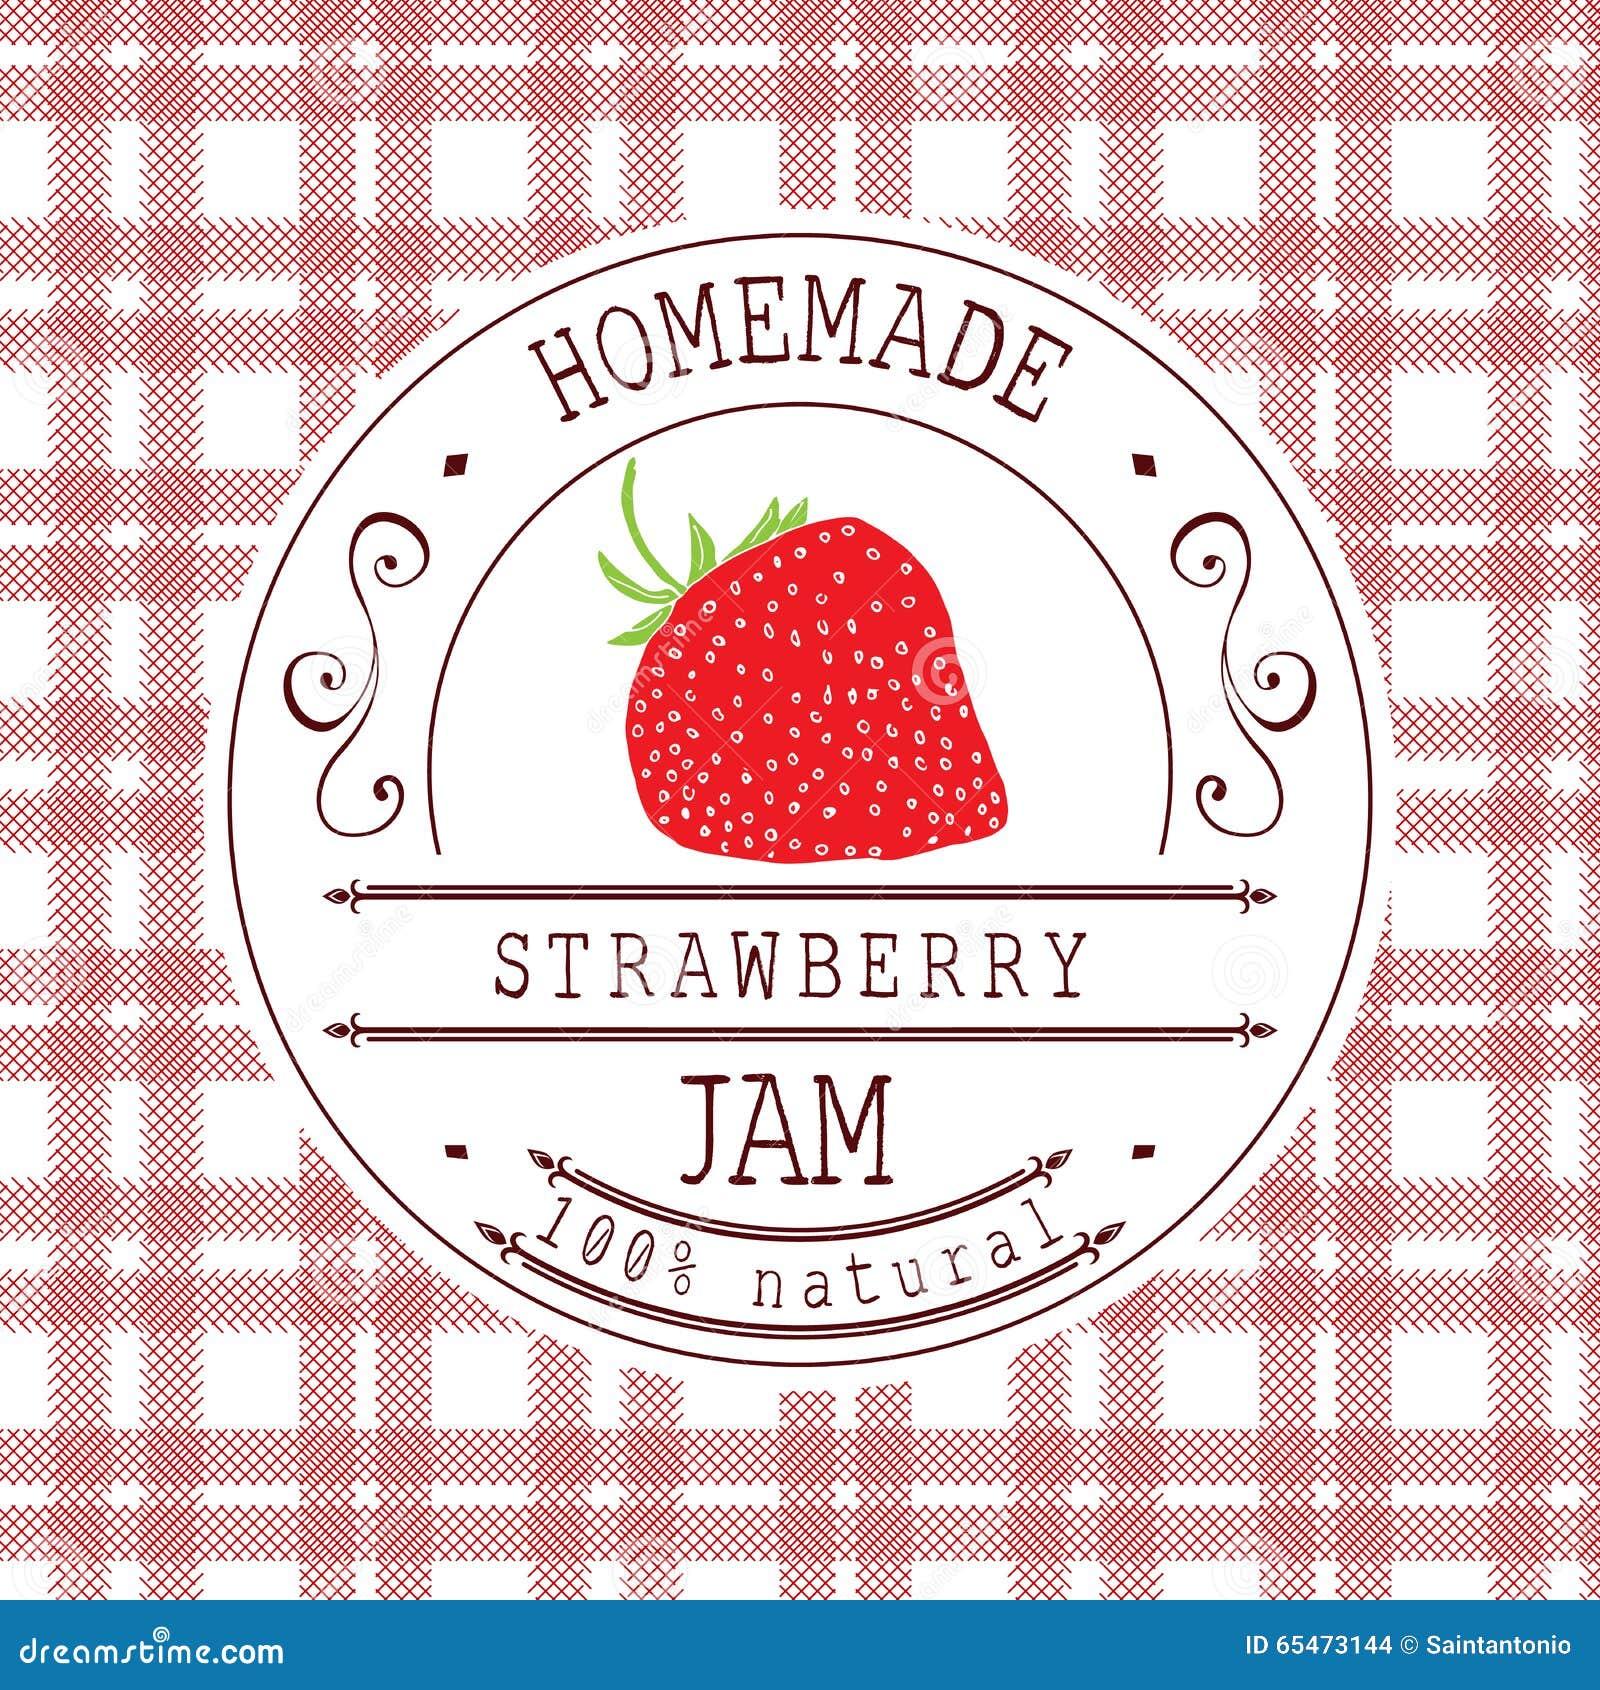 jam label design template for strawberry dessert product